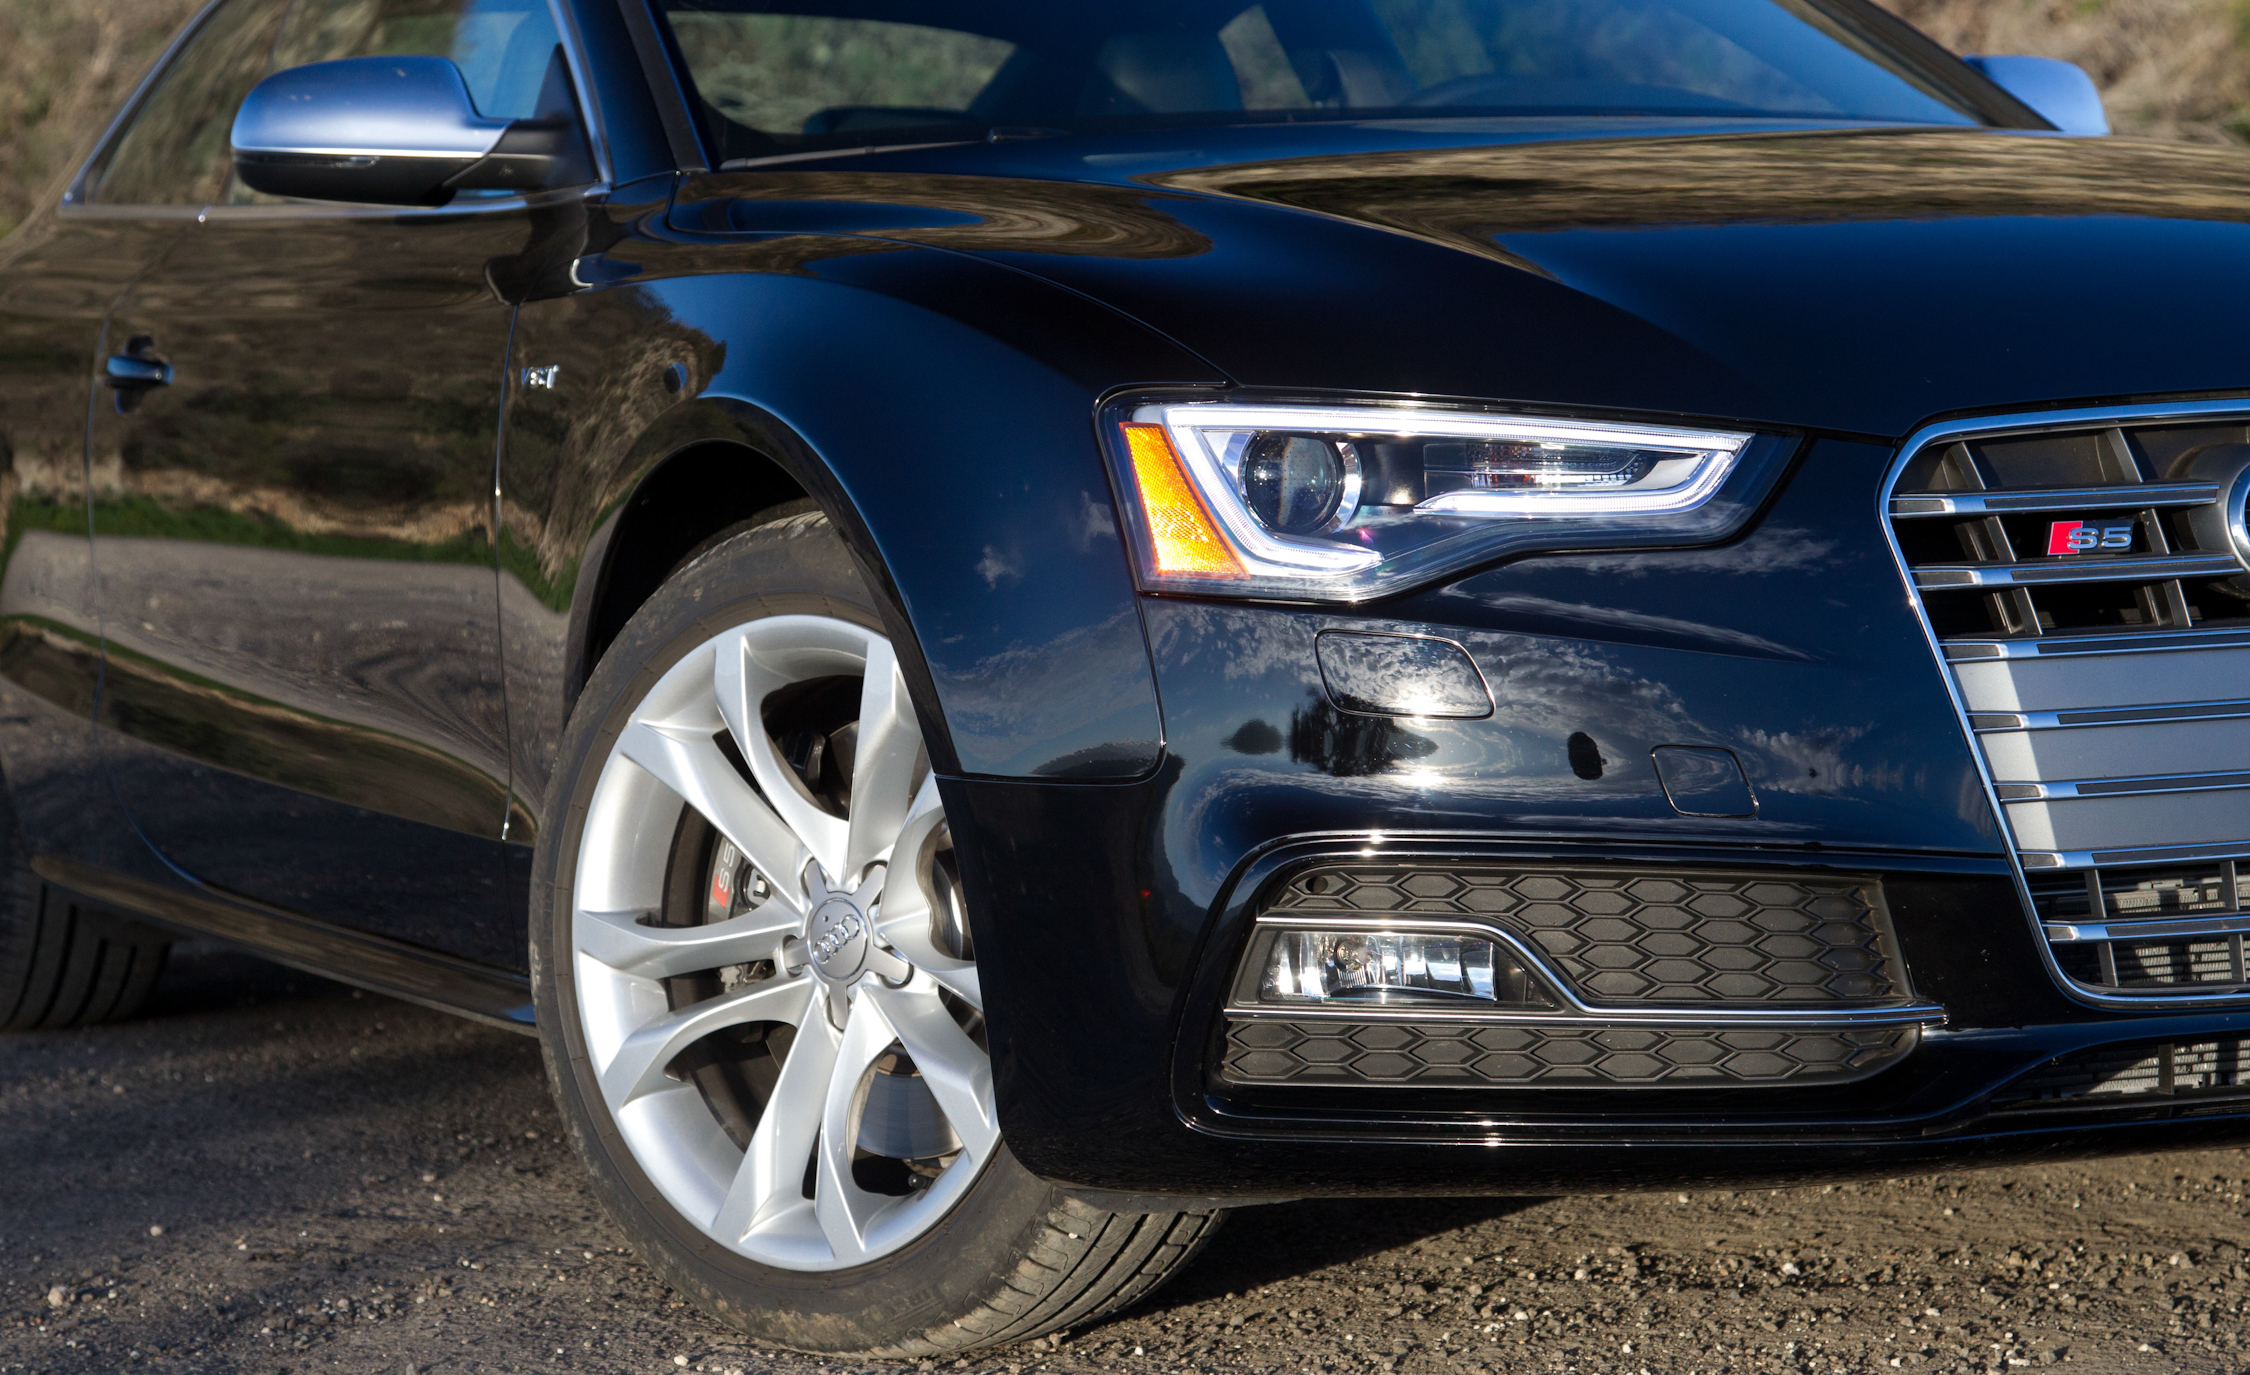 2015 Audi S5 Headlamp and Wheel